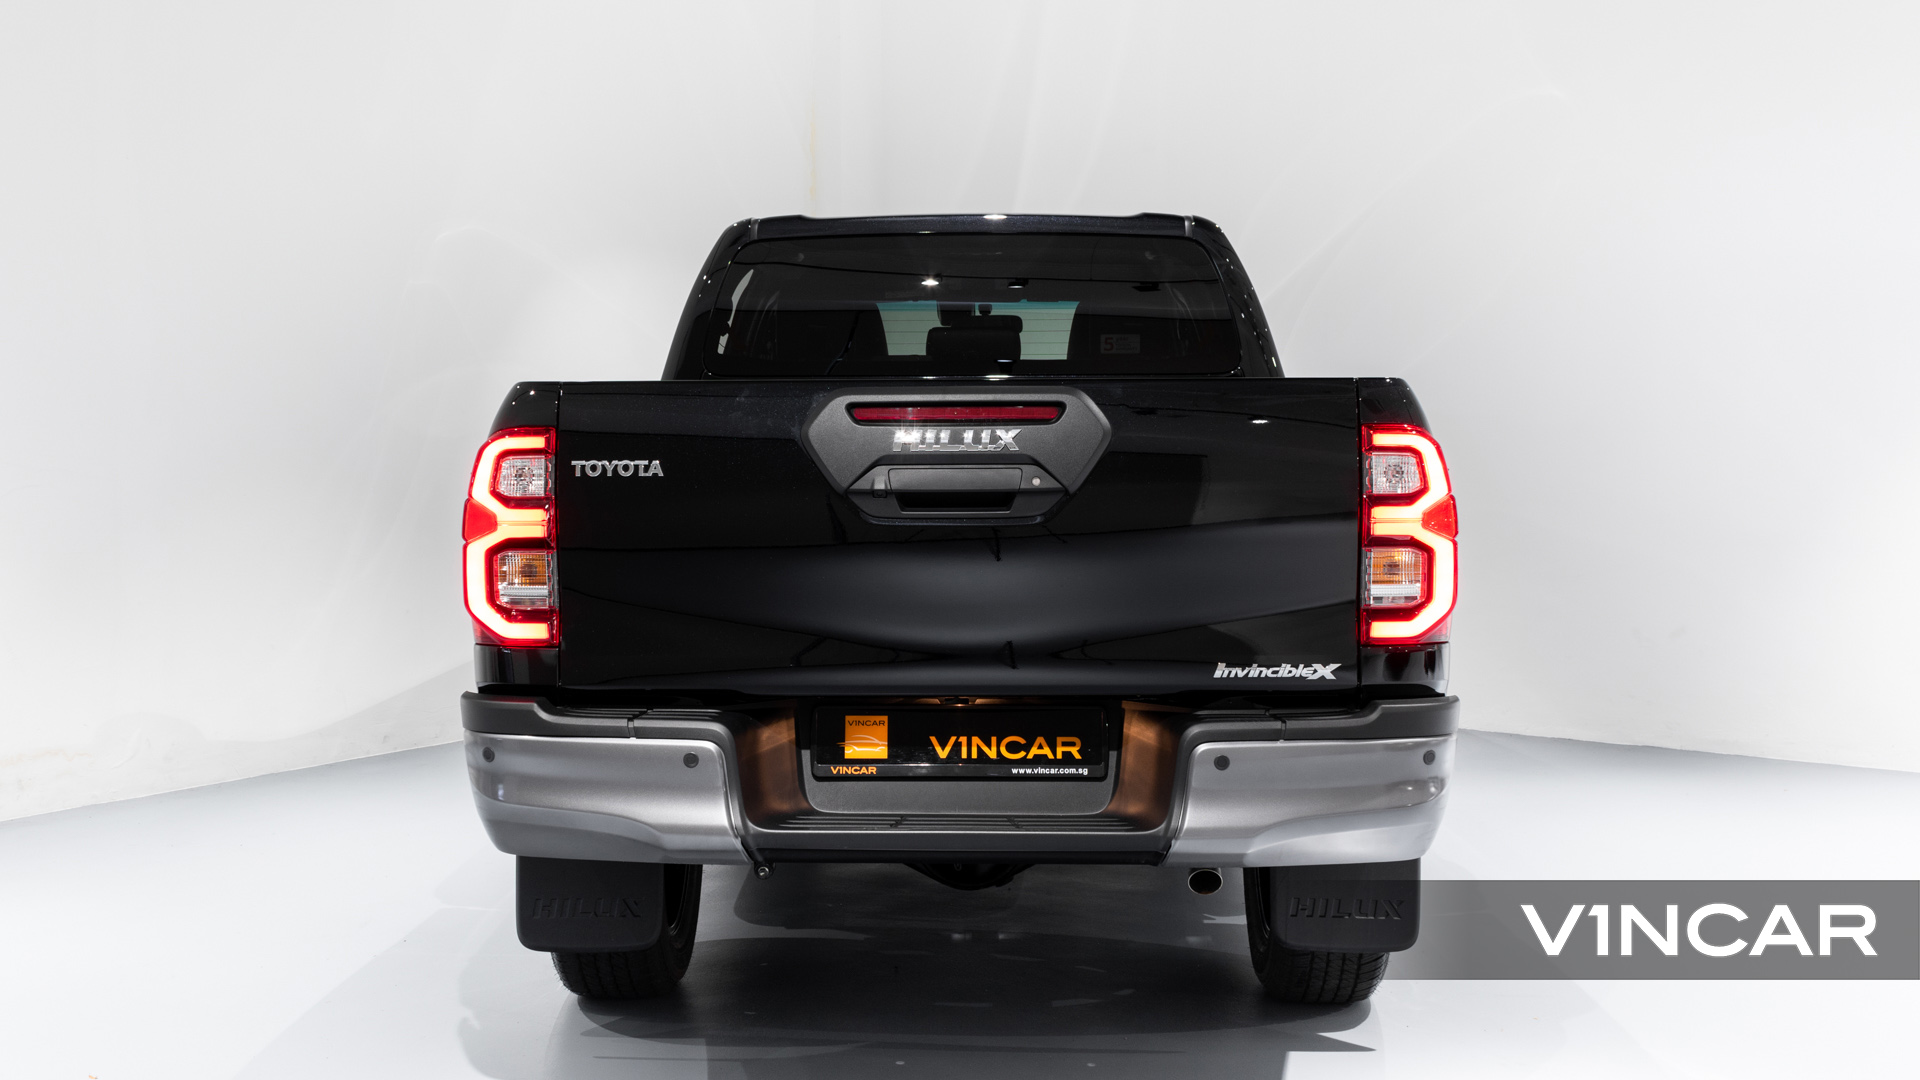 Toyota Hilux Double Cab Auto Invincible X (FL2021) - Rear Direct